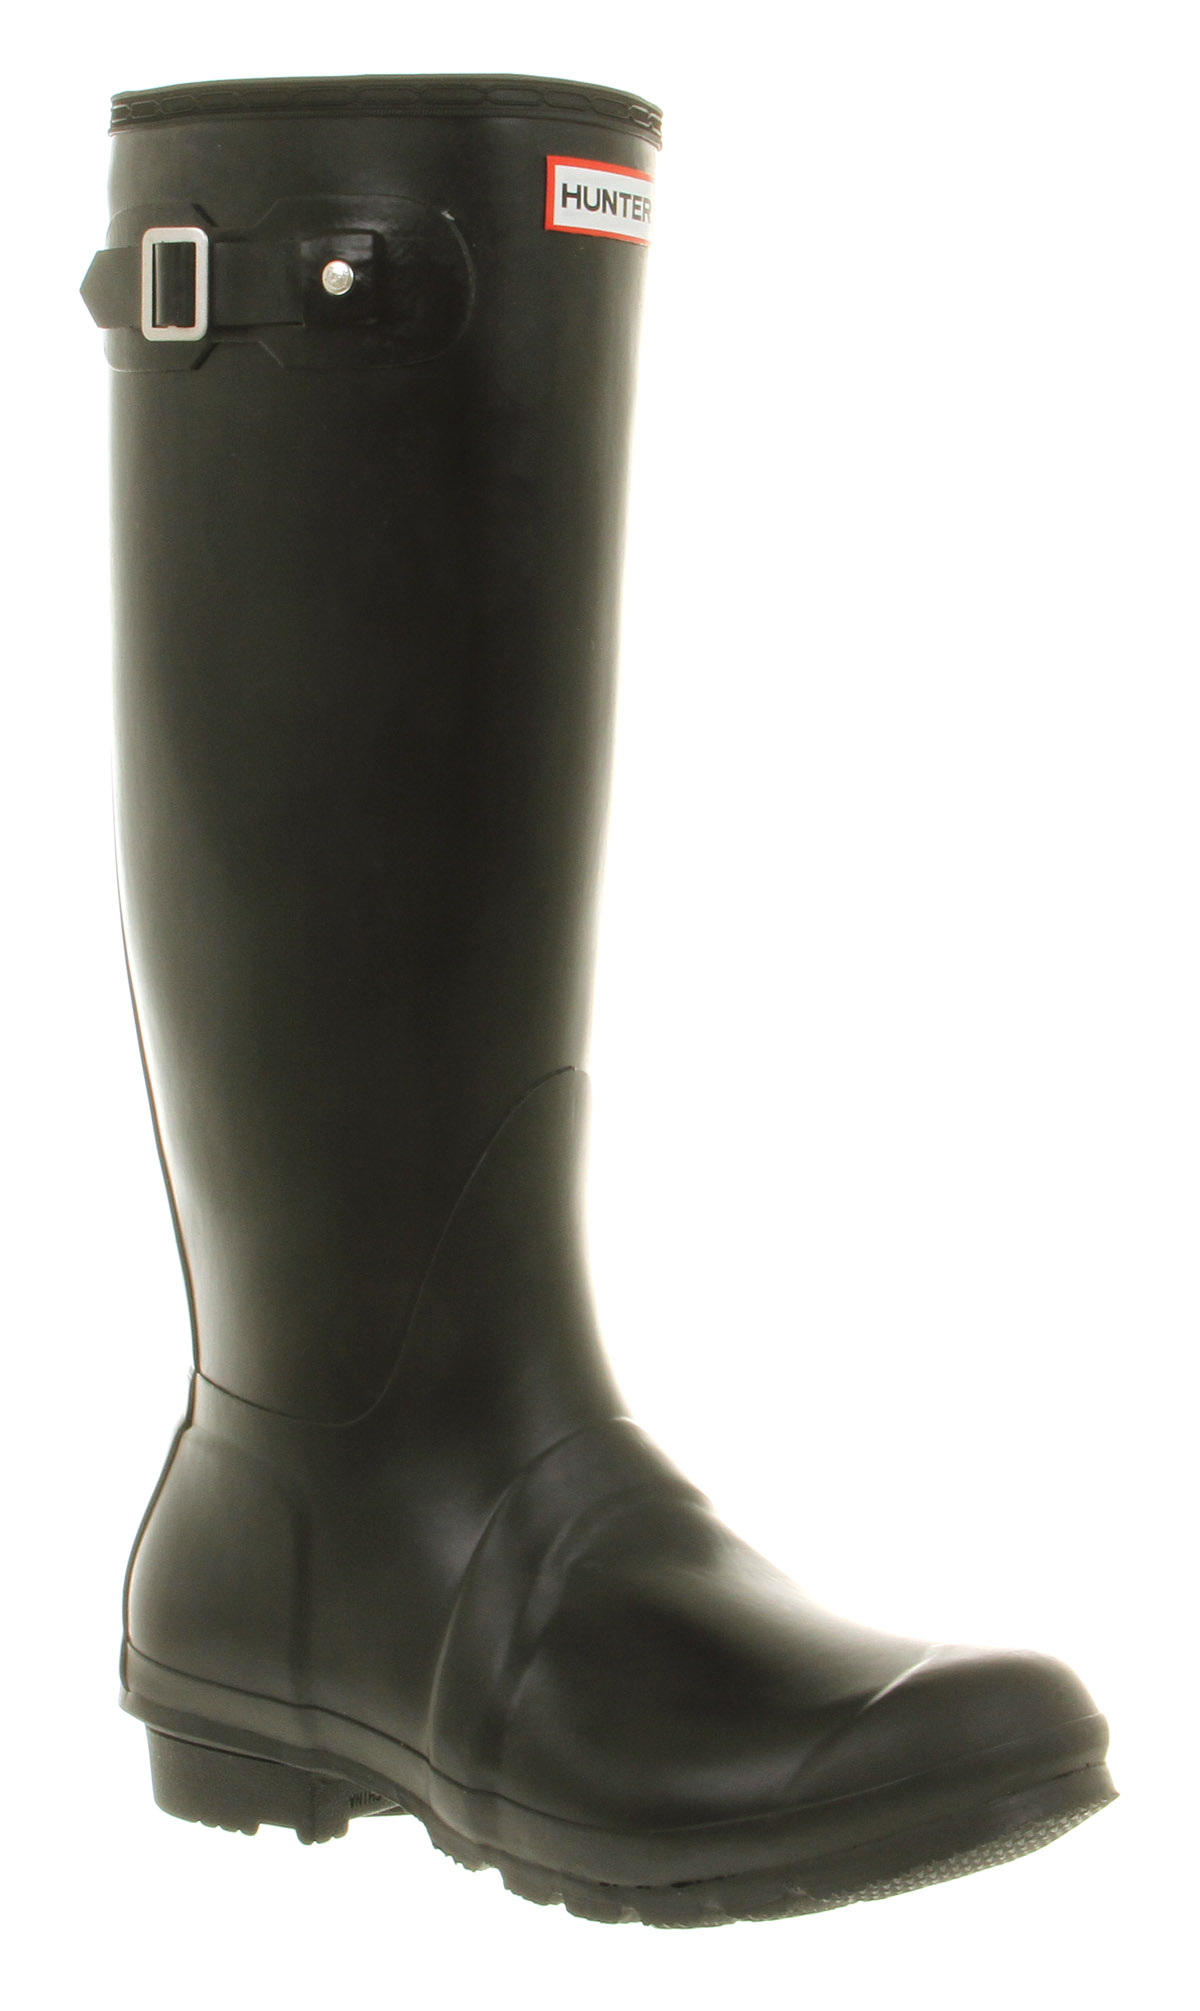 mens original wellies black rubber boots